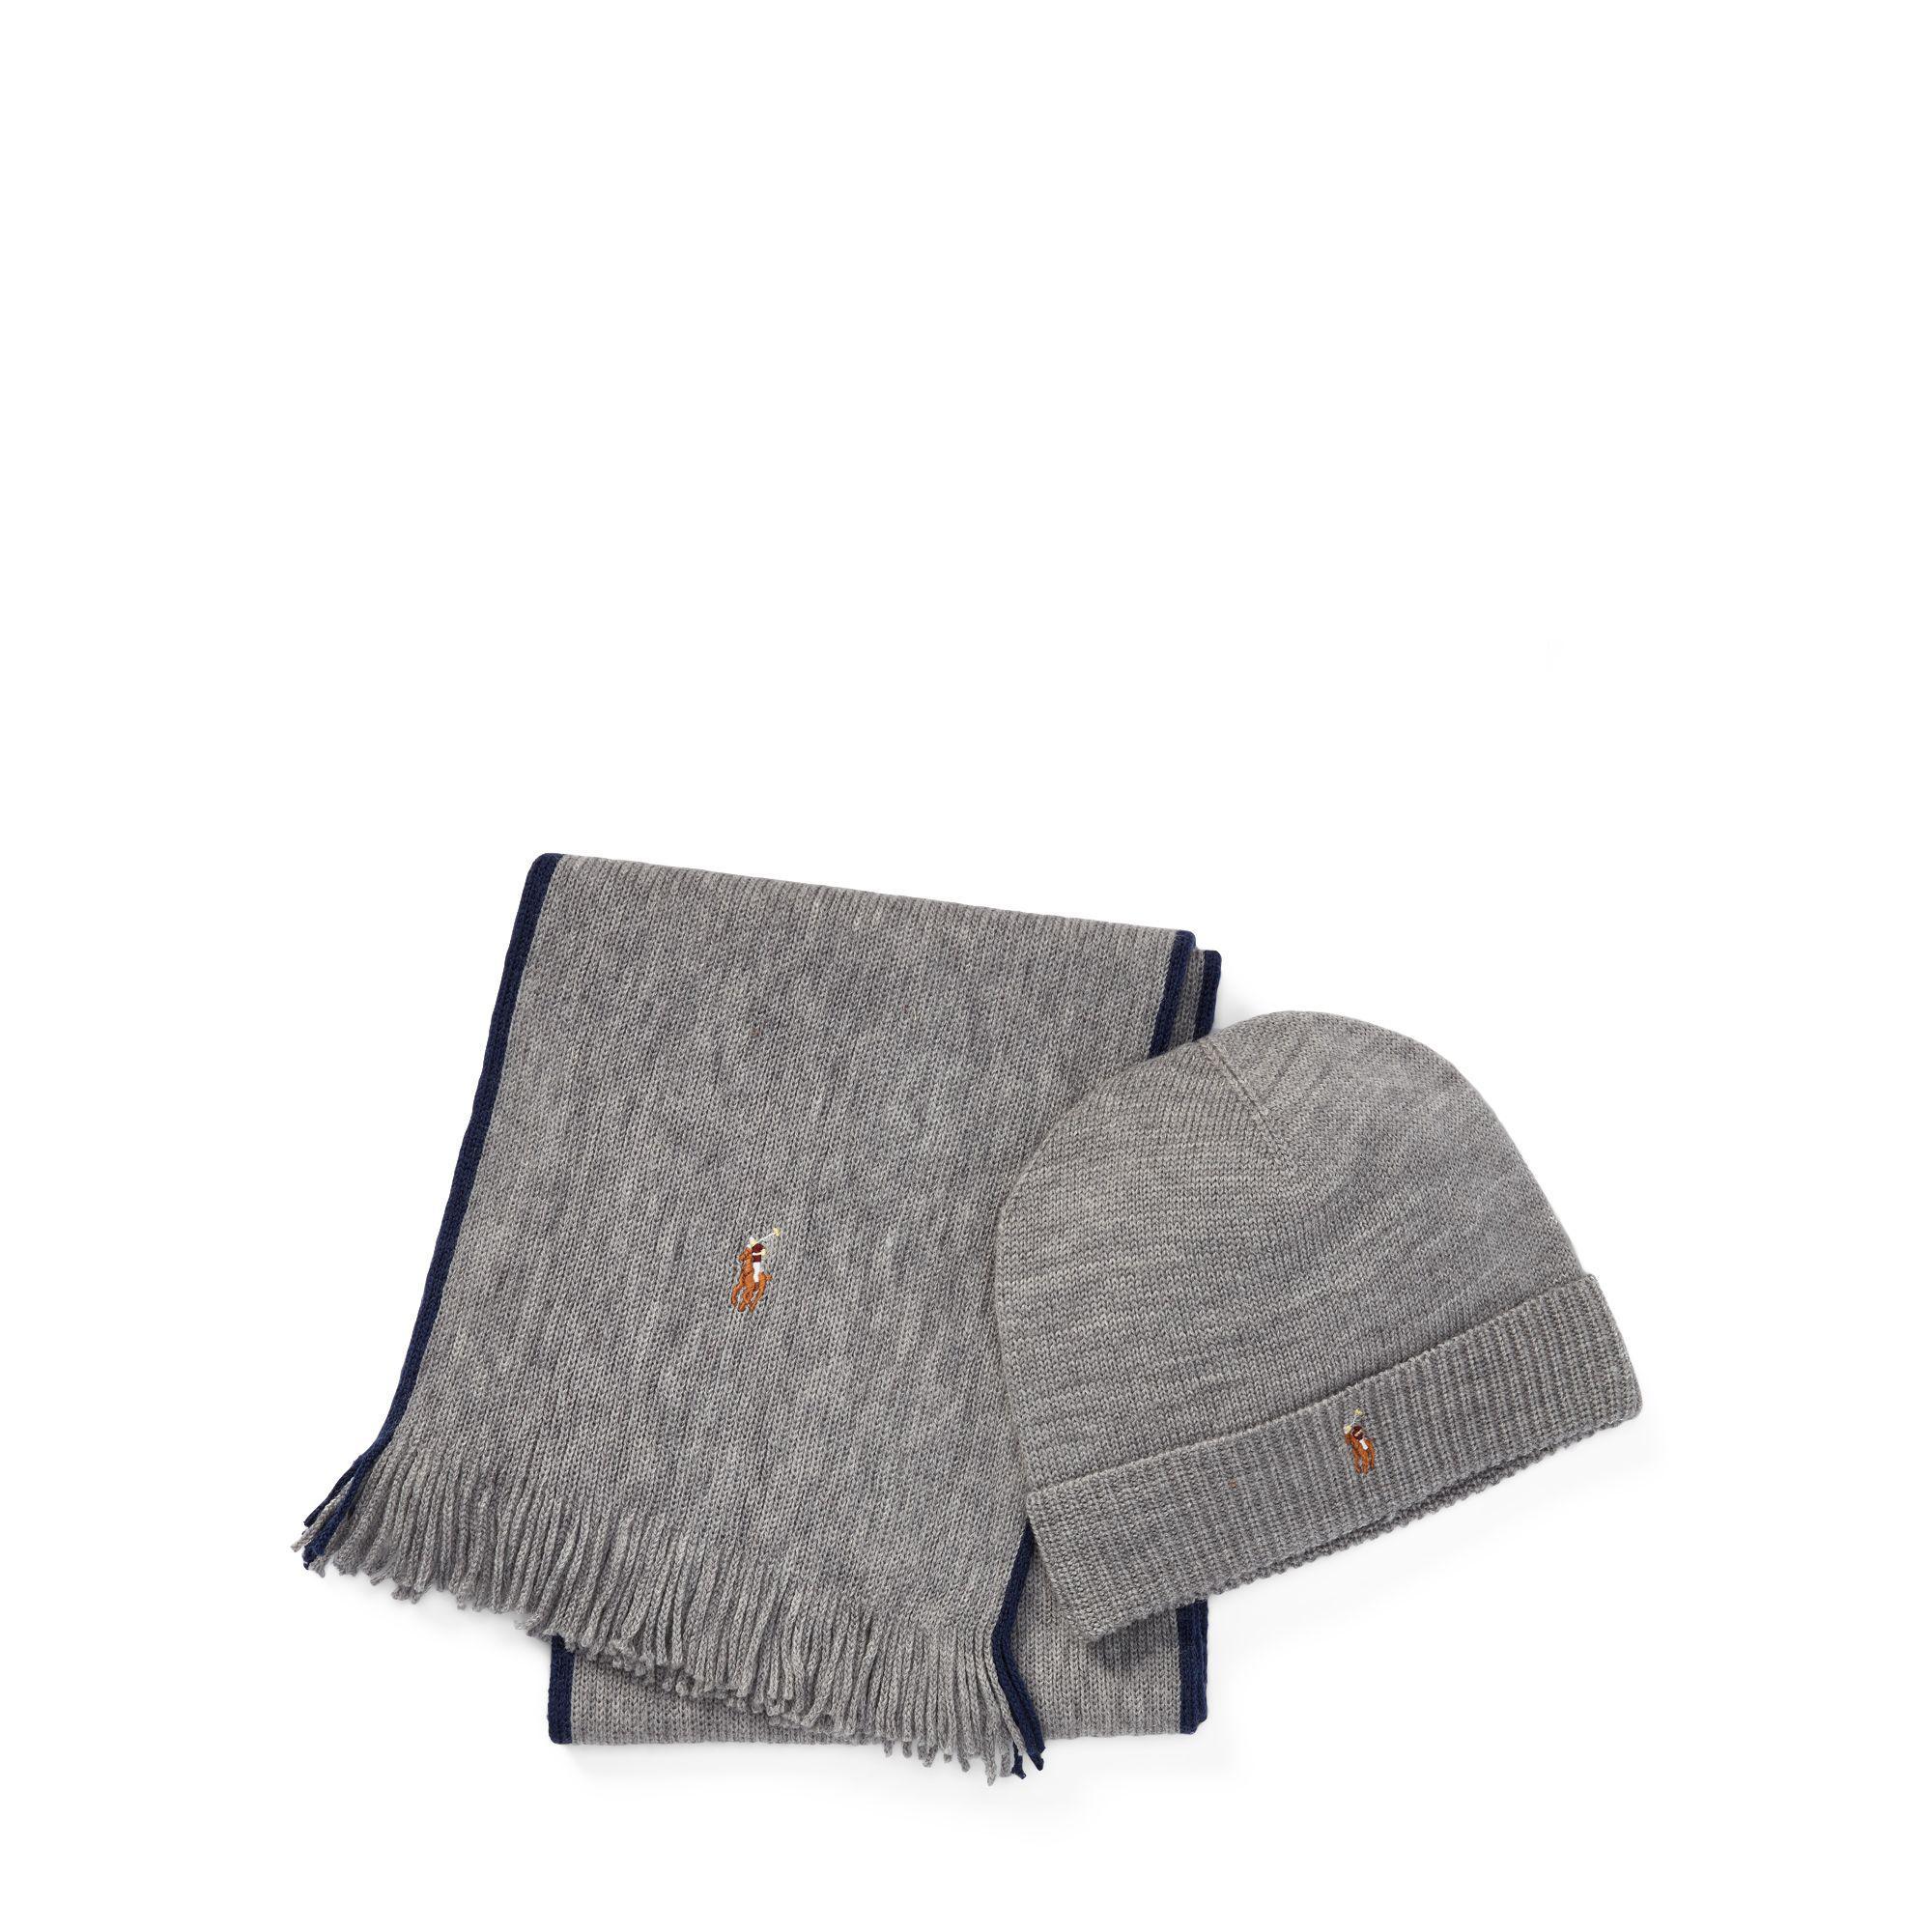 810ac055018 Polo Ralph Lauren - Gray Hat   Scarf Gift Set for Men - Lyst. View  fullscreen